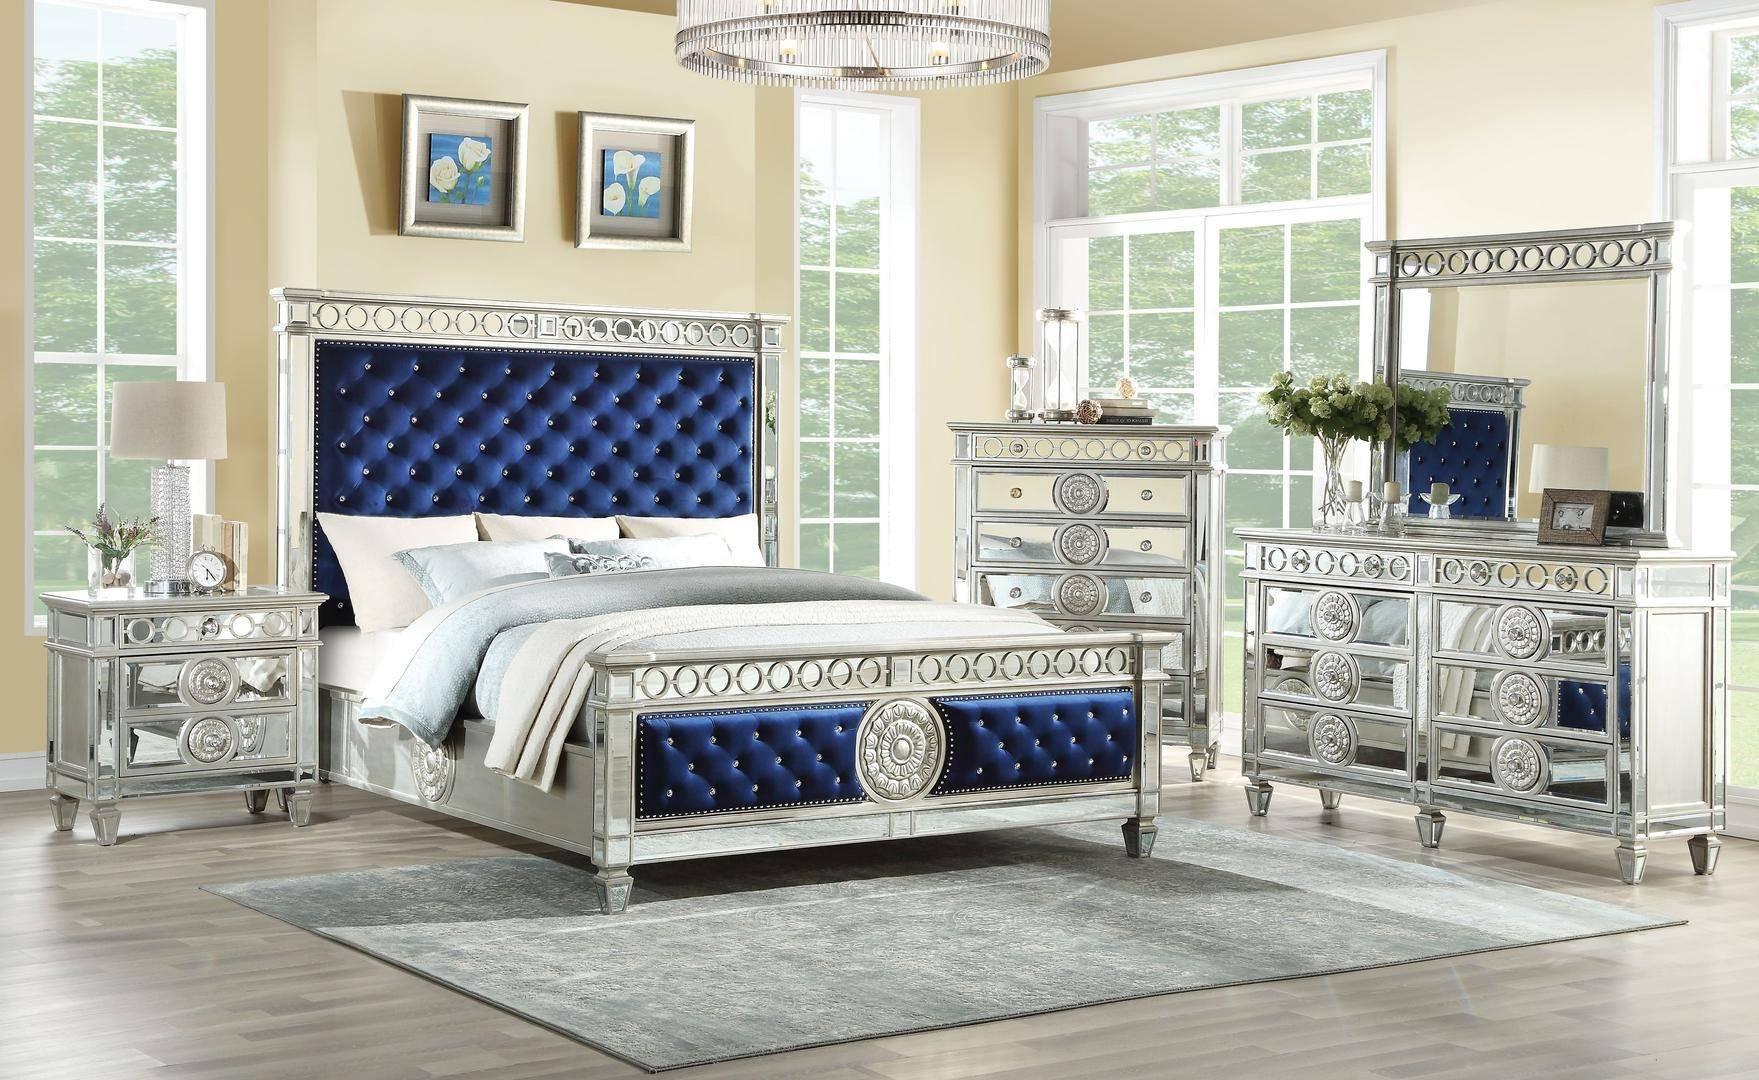 Buy Acme Varian Queen Panel Bedroom Set 5 Pcs In Blue Silver Mirrored Velvet Online